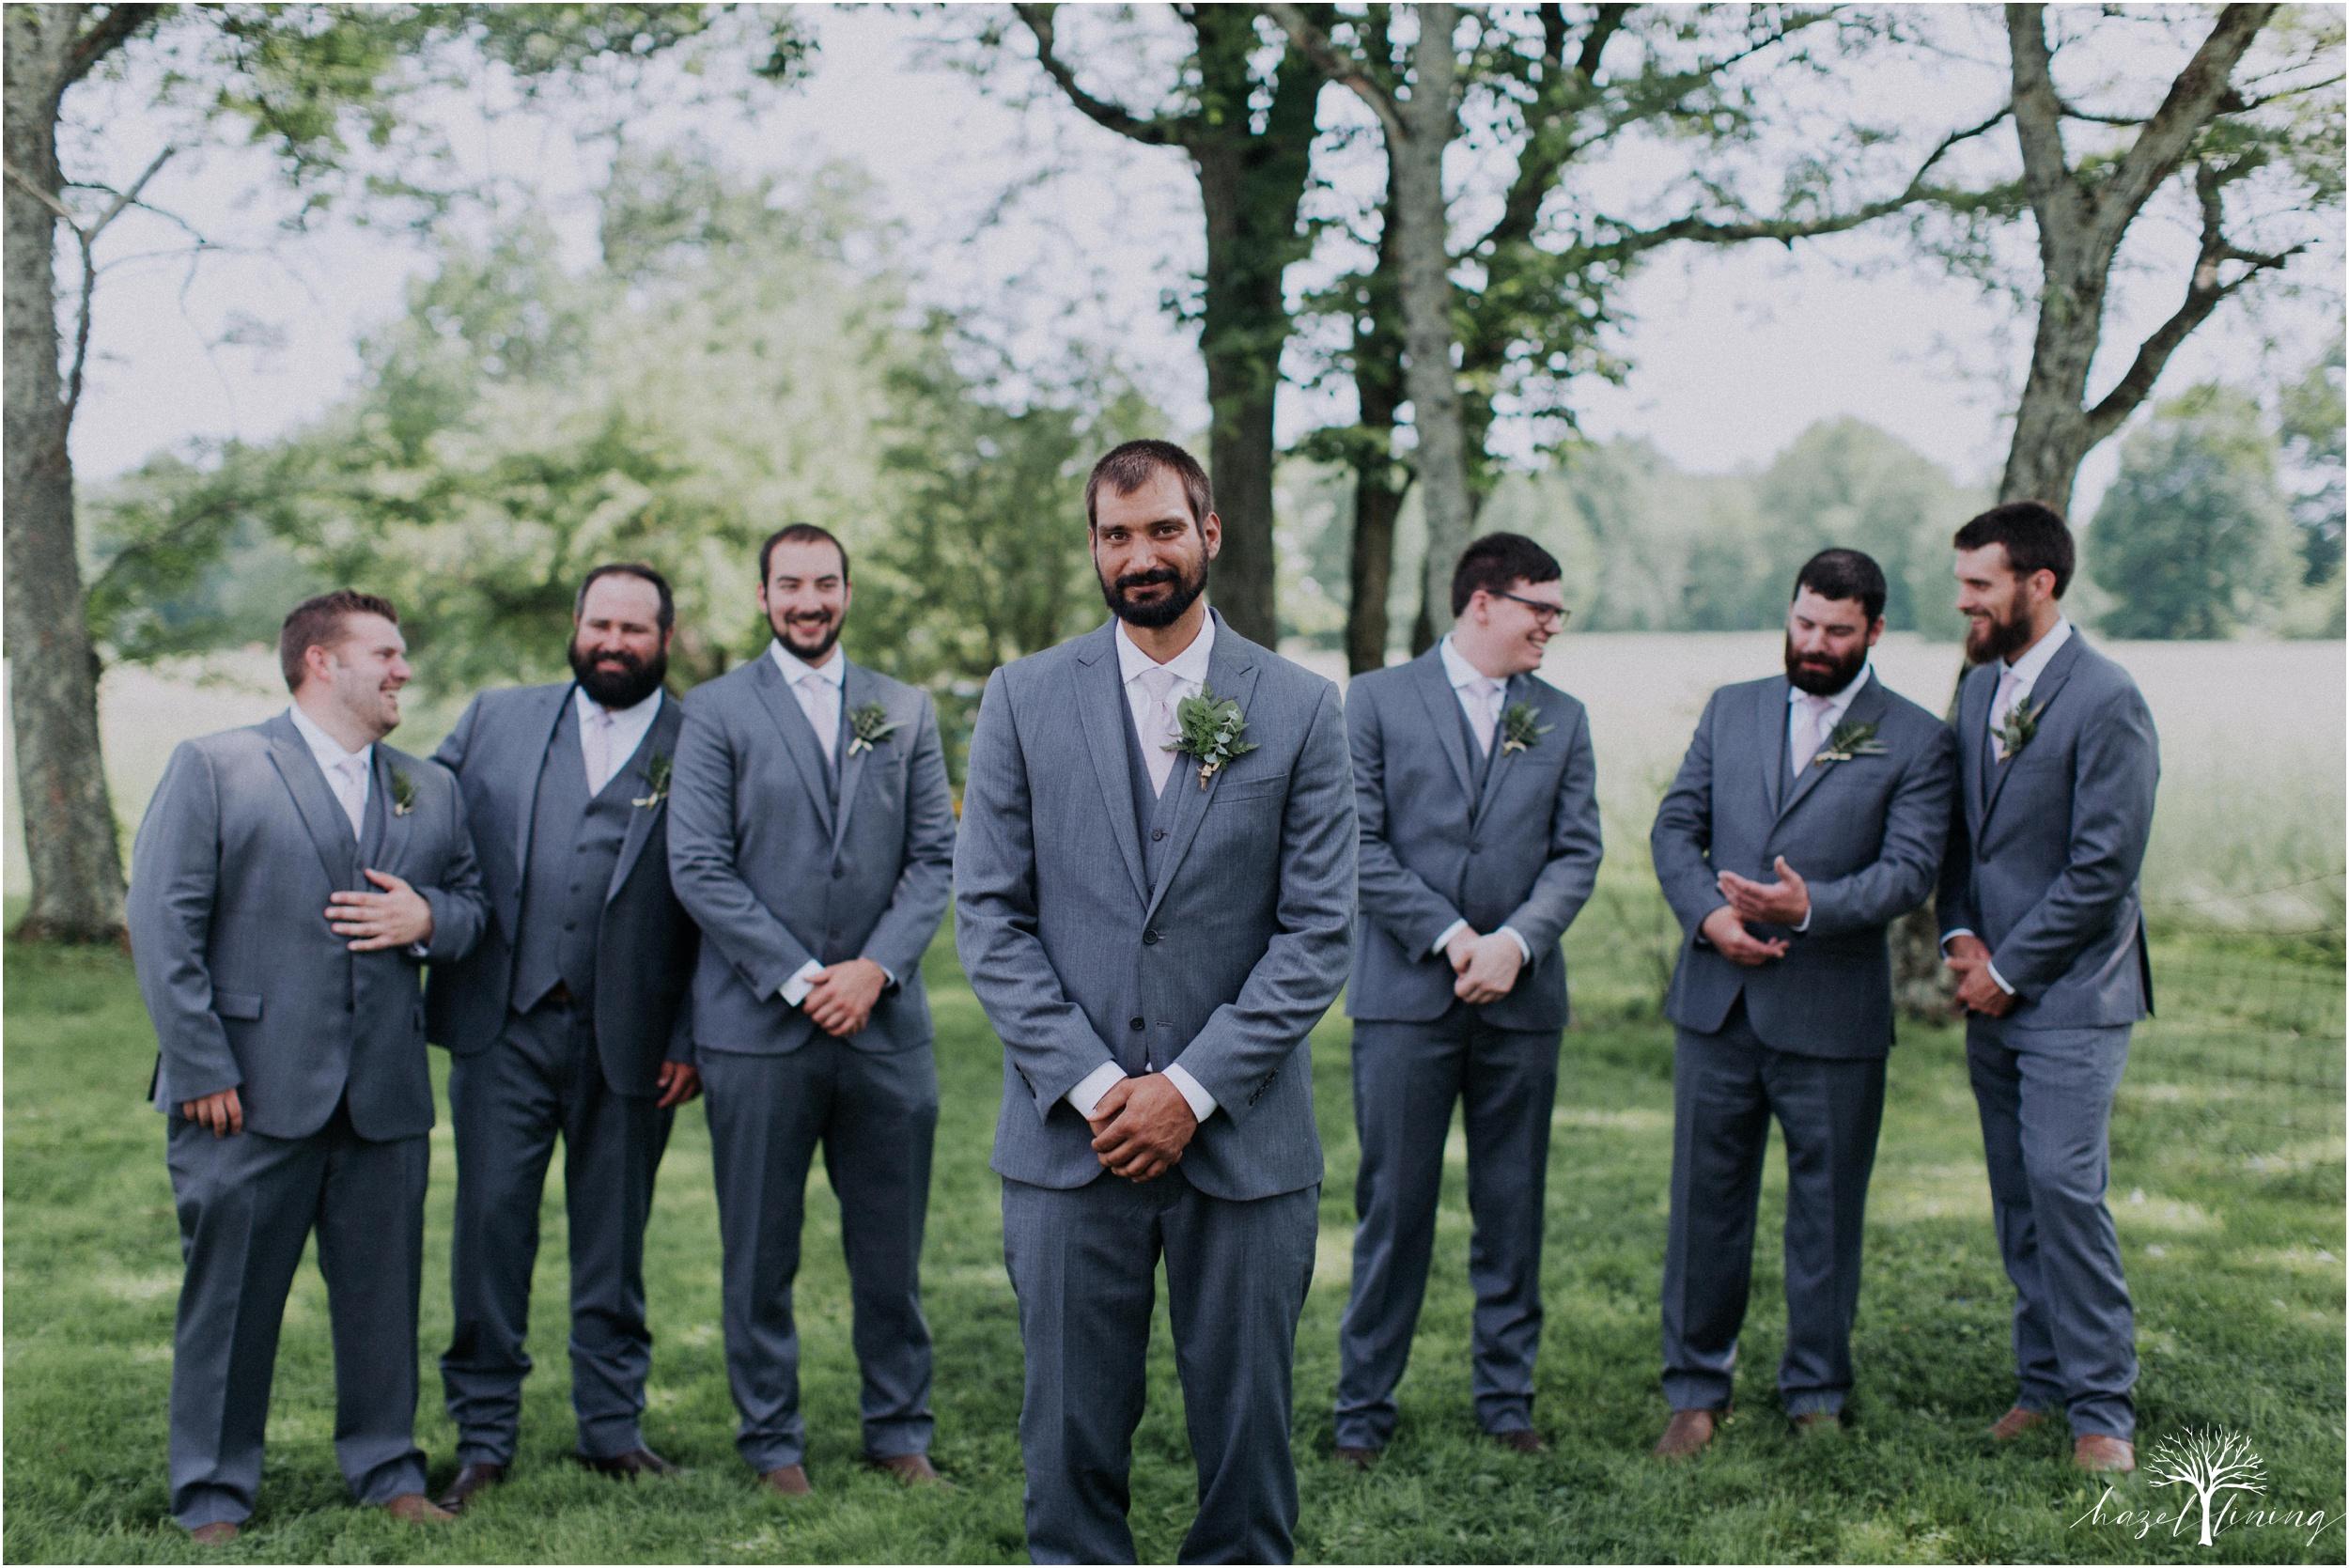 hazel-lining-travel-wedding-elopement-photography-lisa-landon-shoemaker-the-farm-bakery-and-events-bucks-county-quakertown-pennsylvania-summer-country-outdoor-farm-wedding_0046.jpg